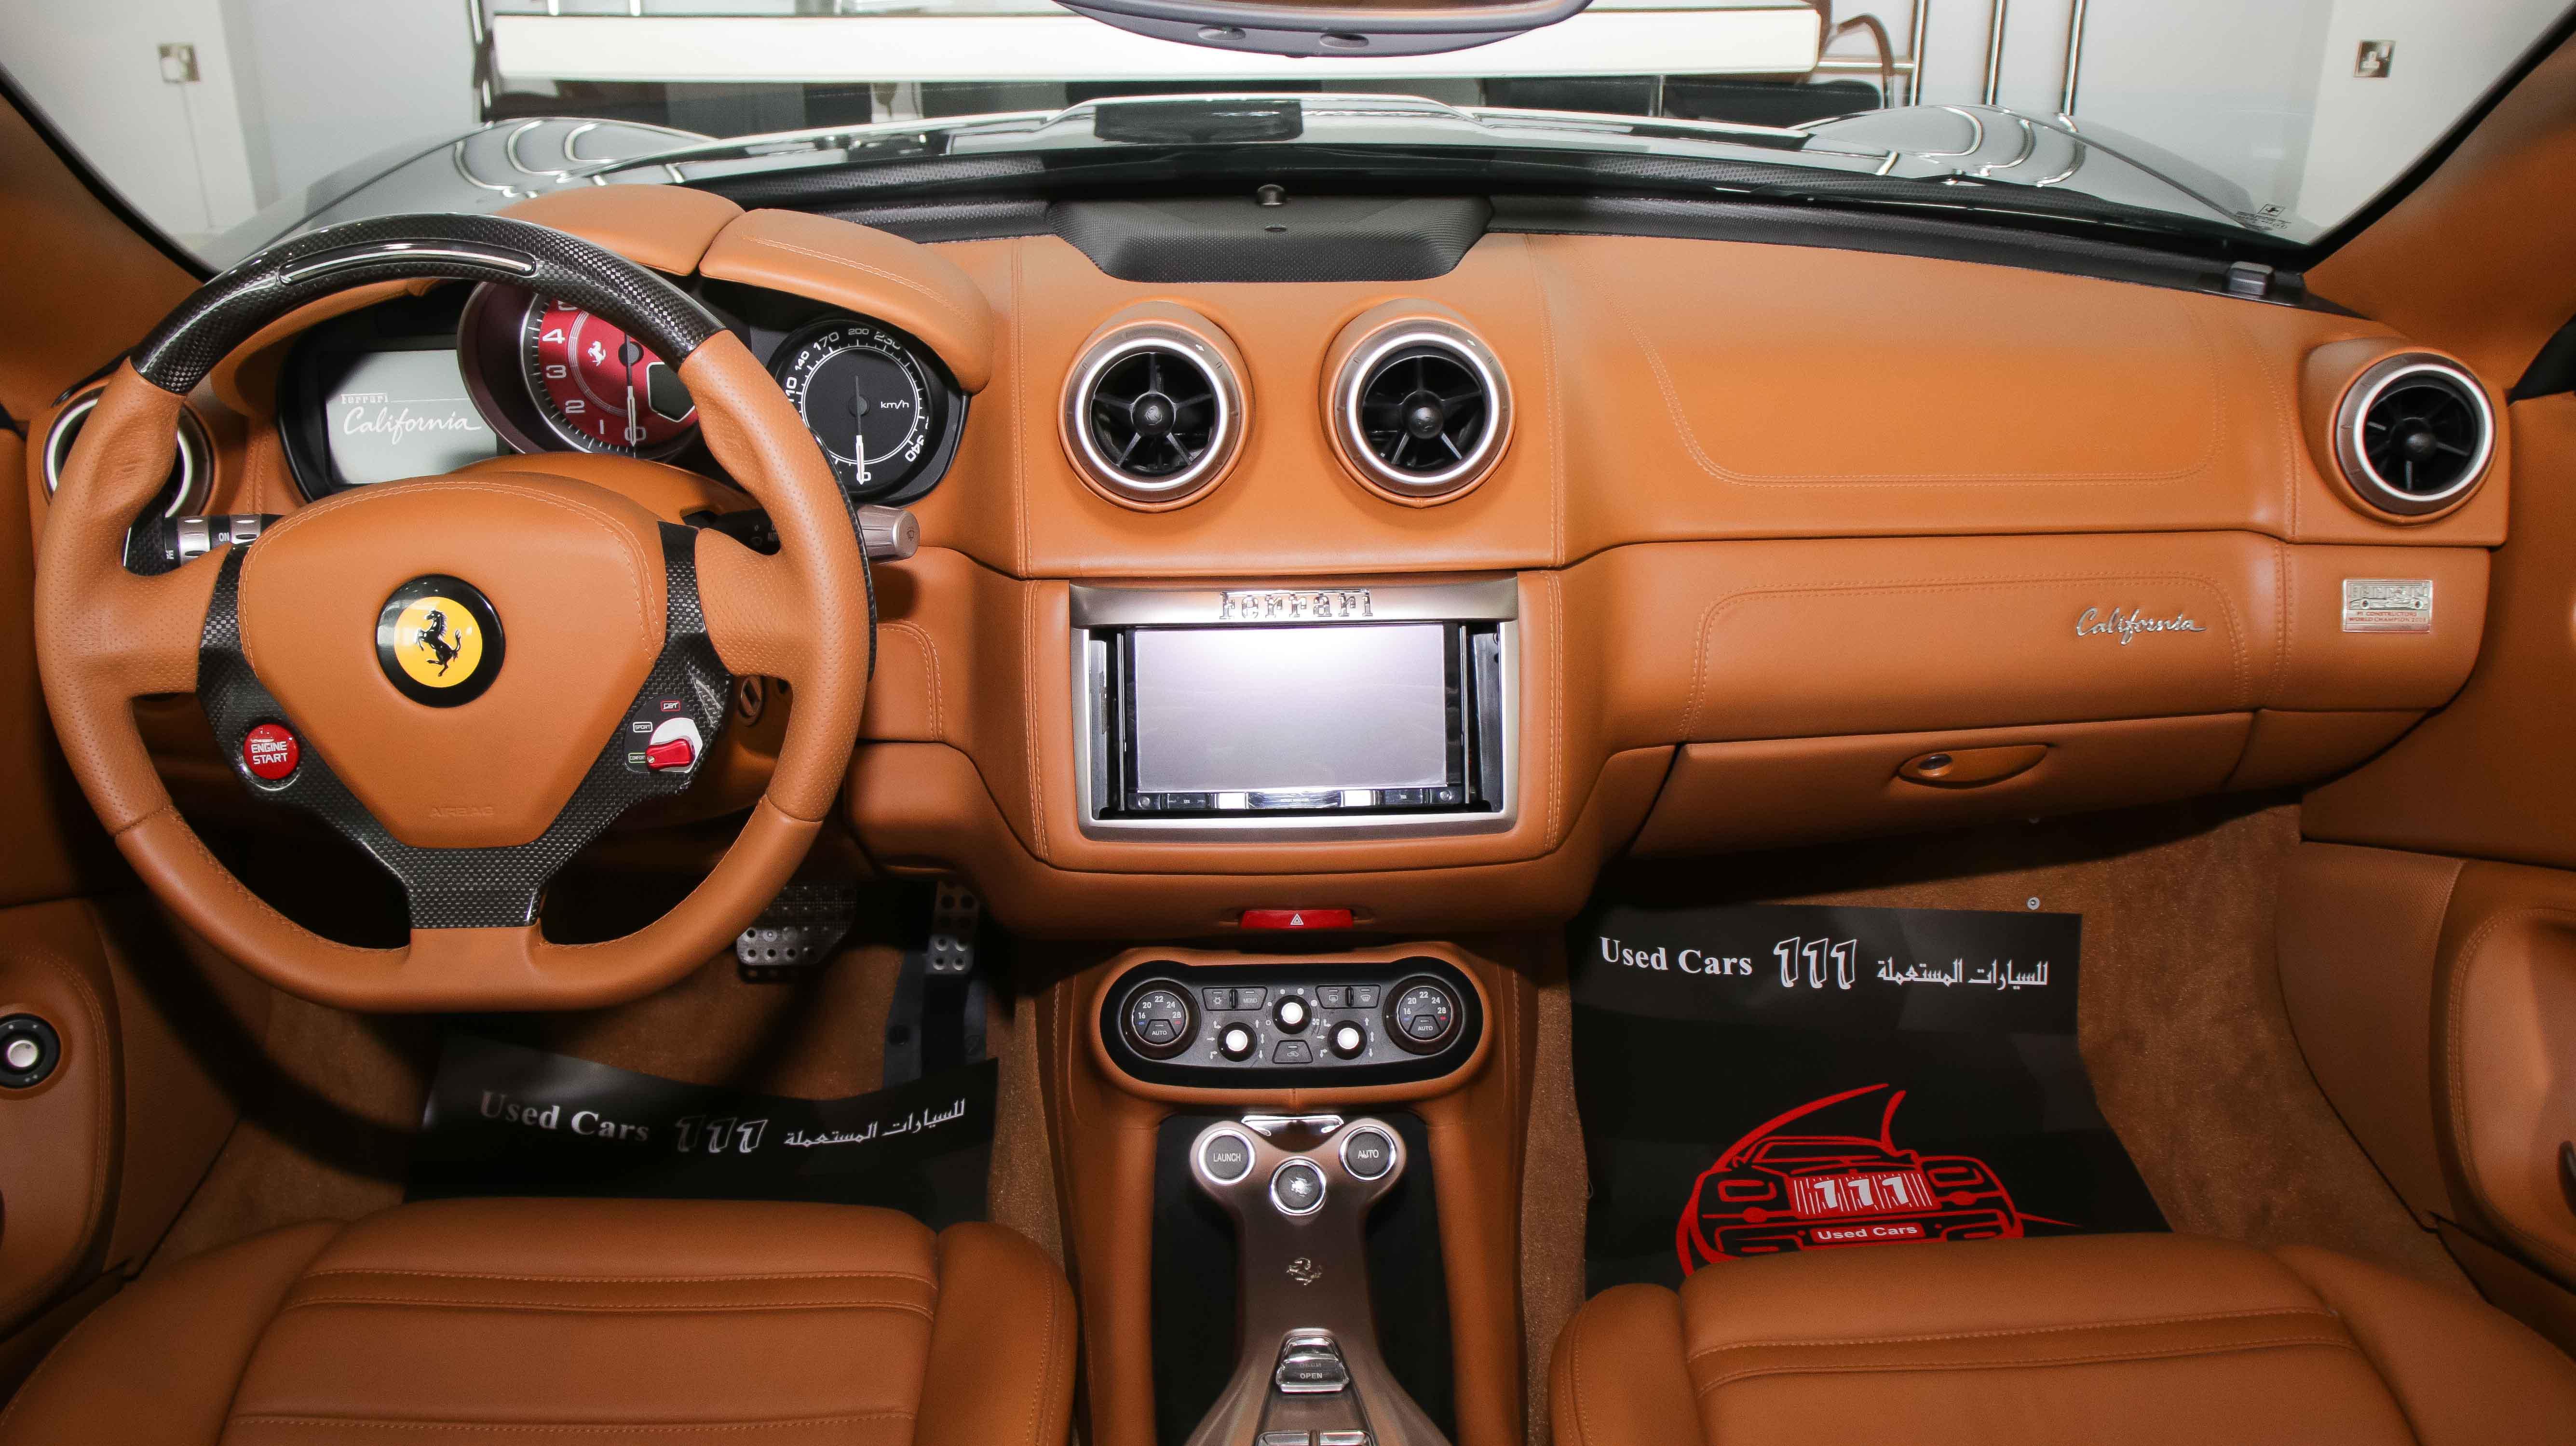 2010 Ferrari California Black Beige 06 Kargal Dealers Uae